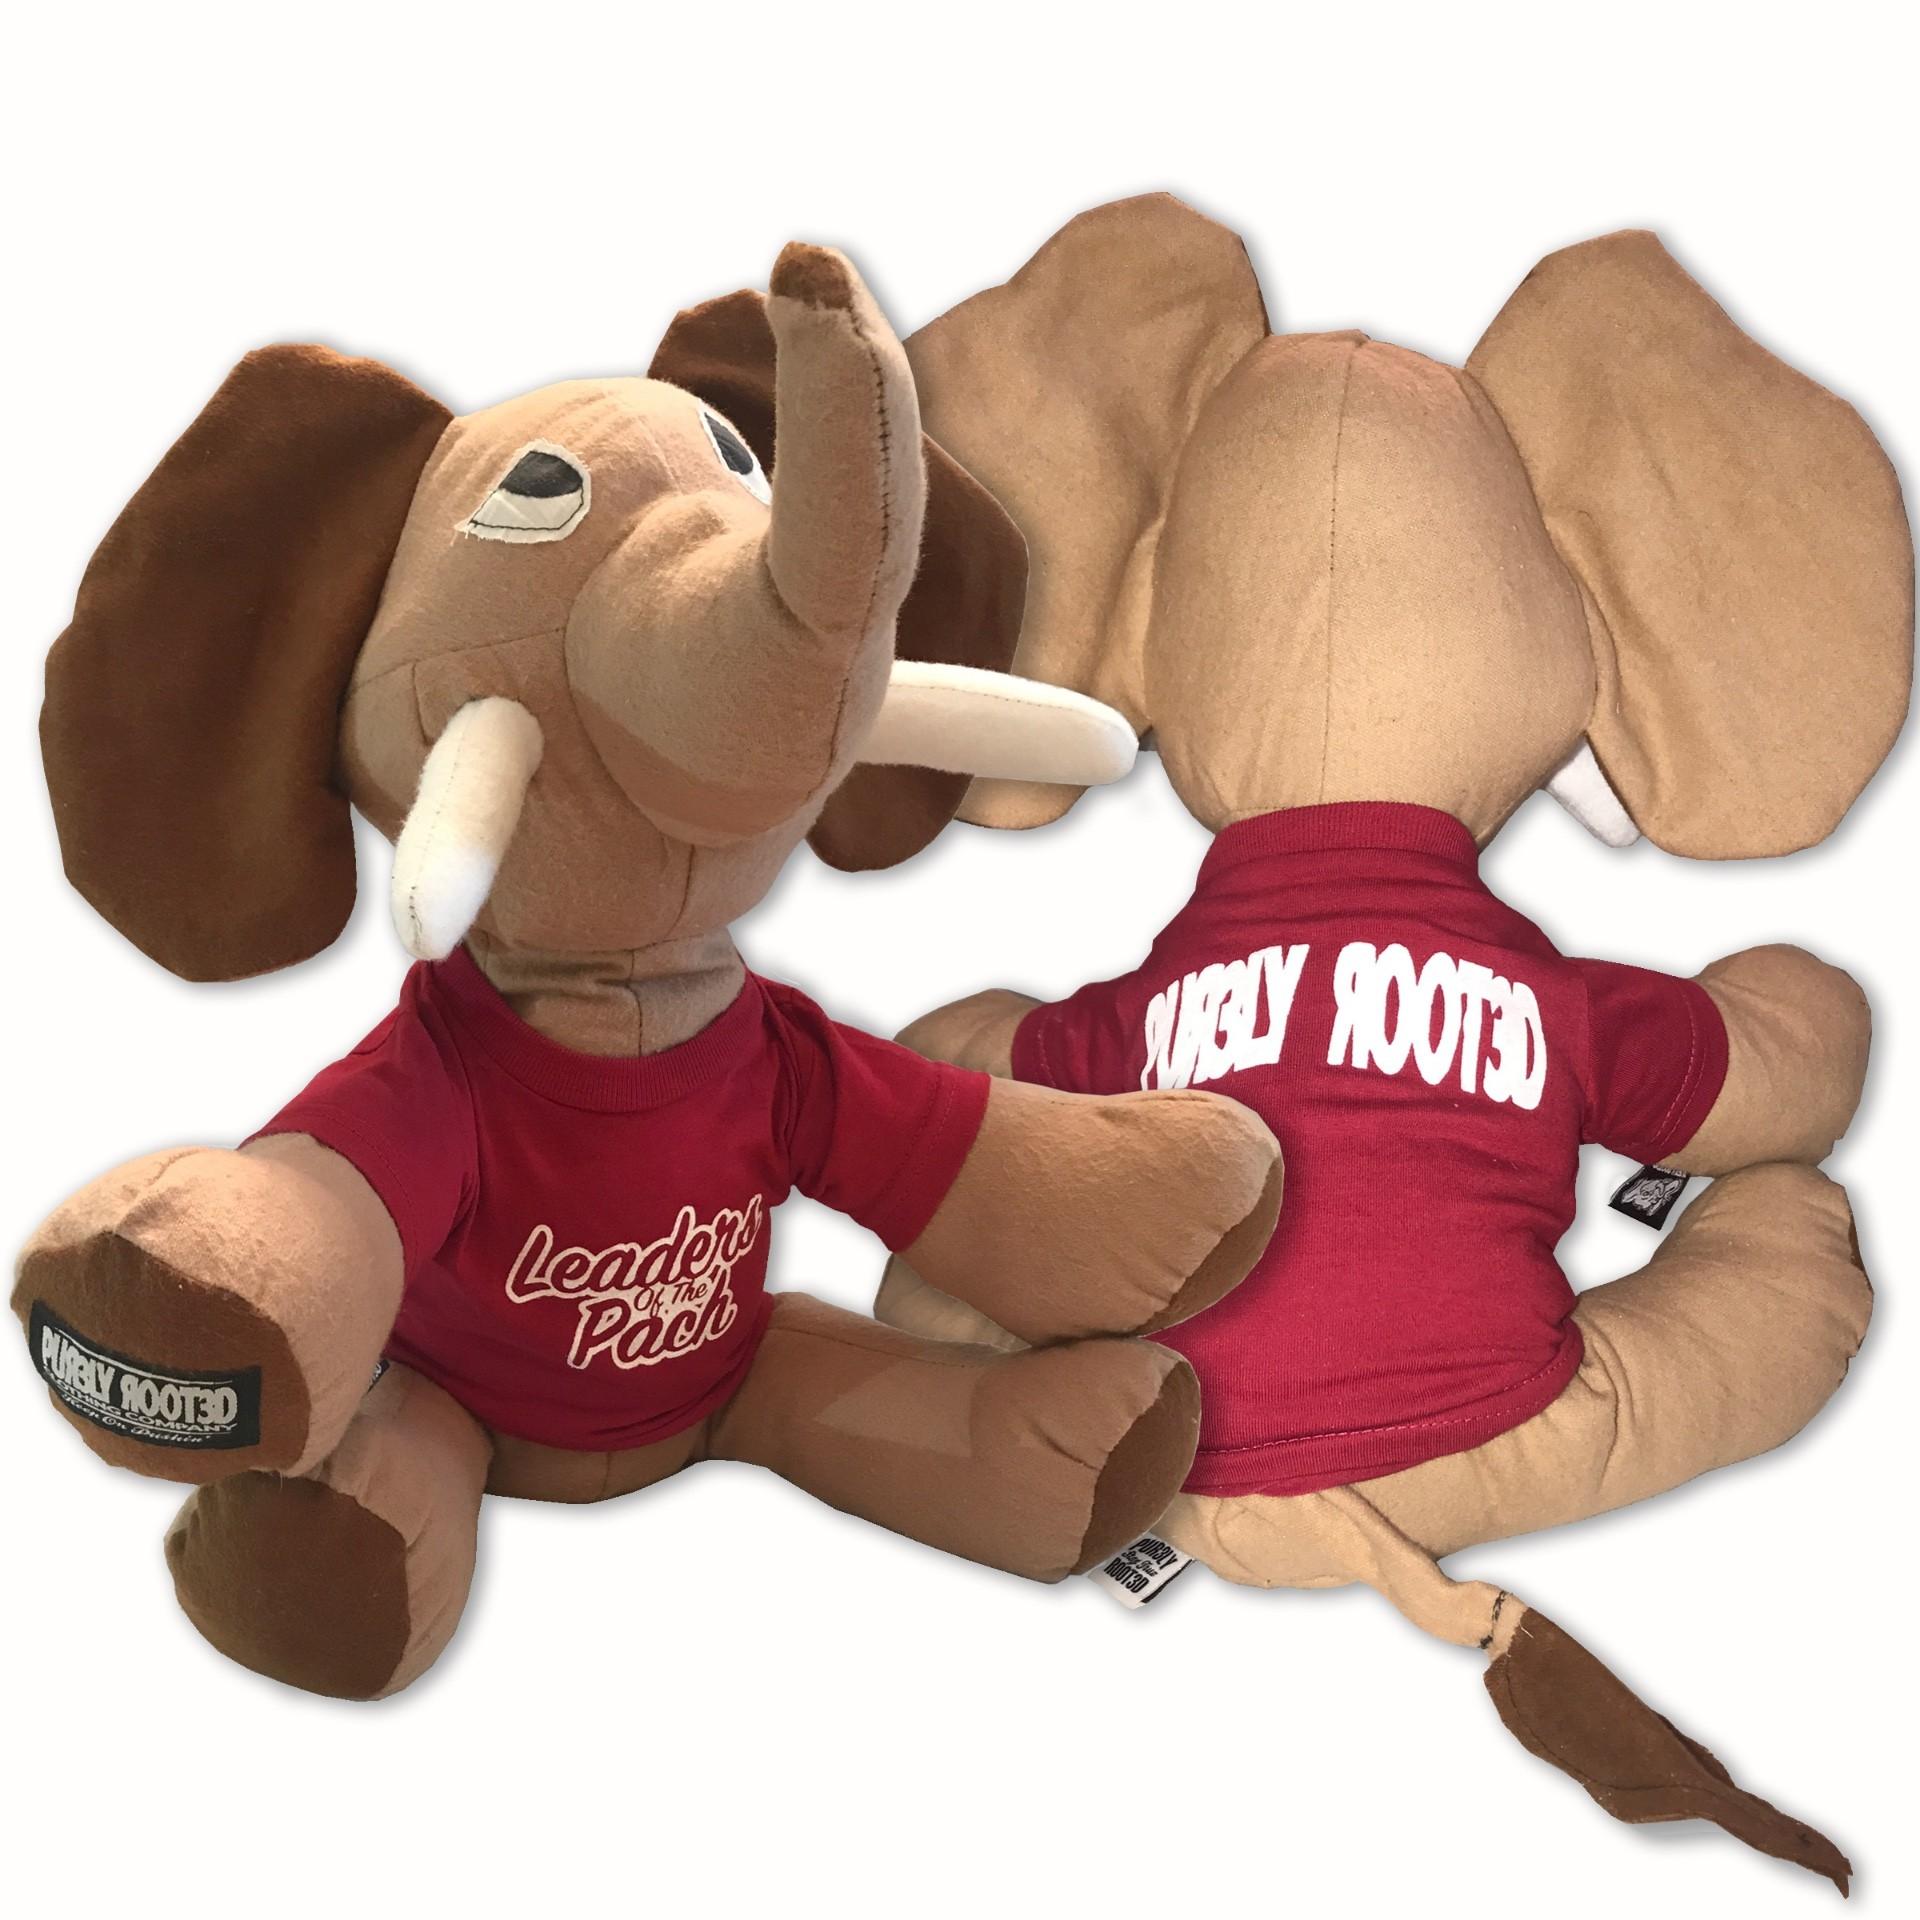 Tusk Mascot Stuffed Elephant Front & Back1